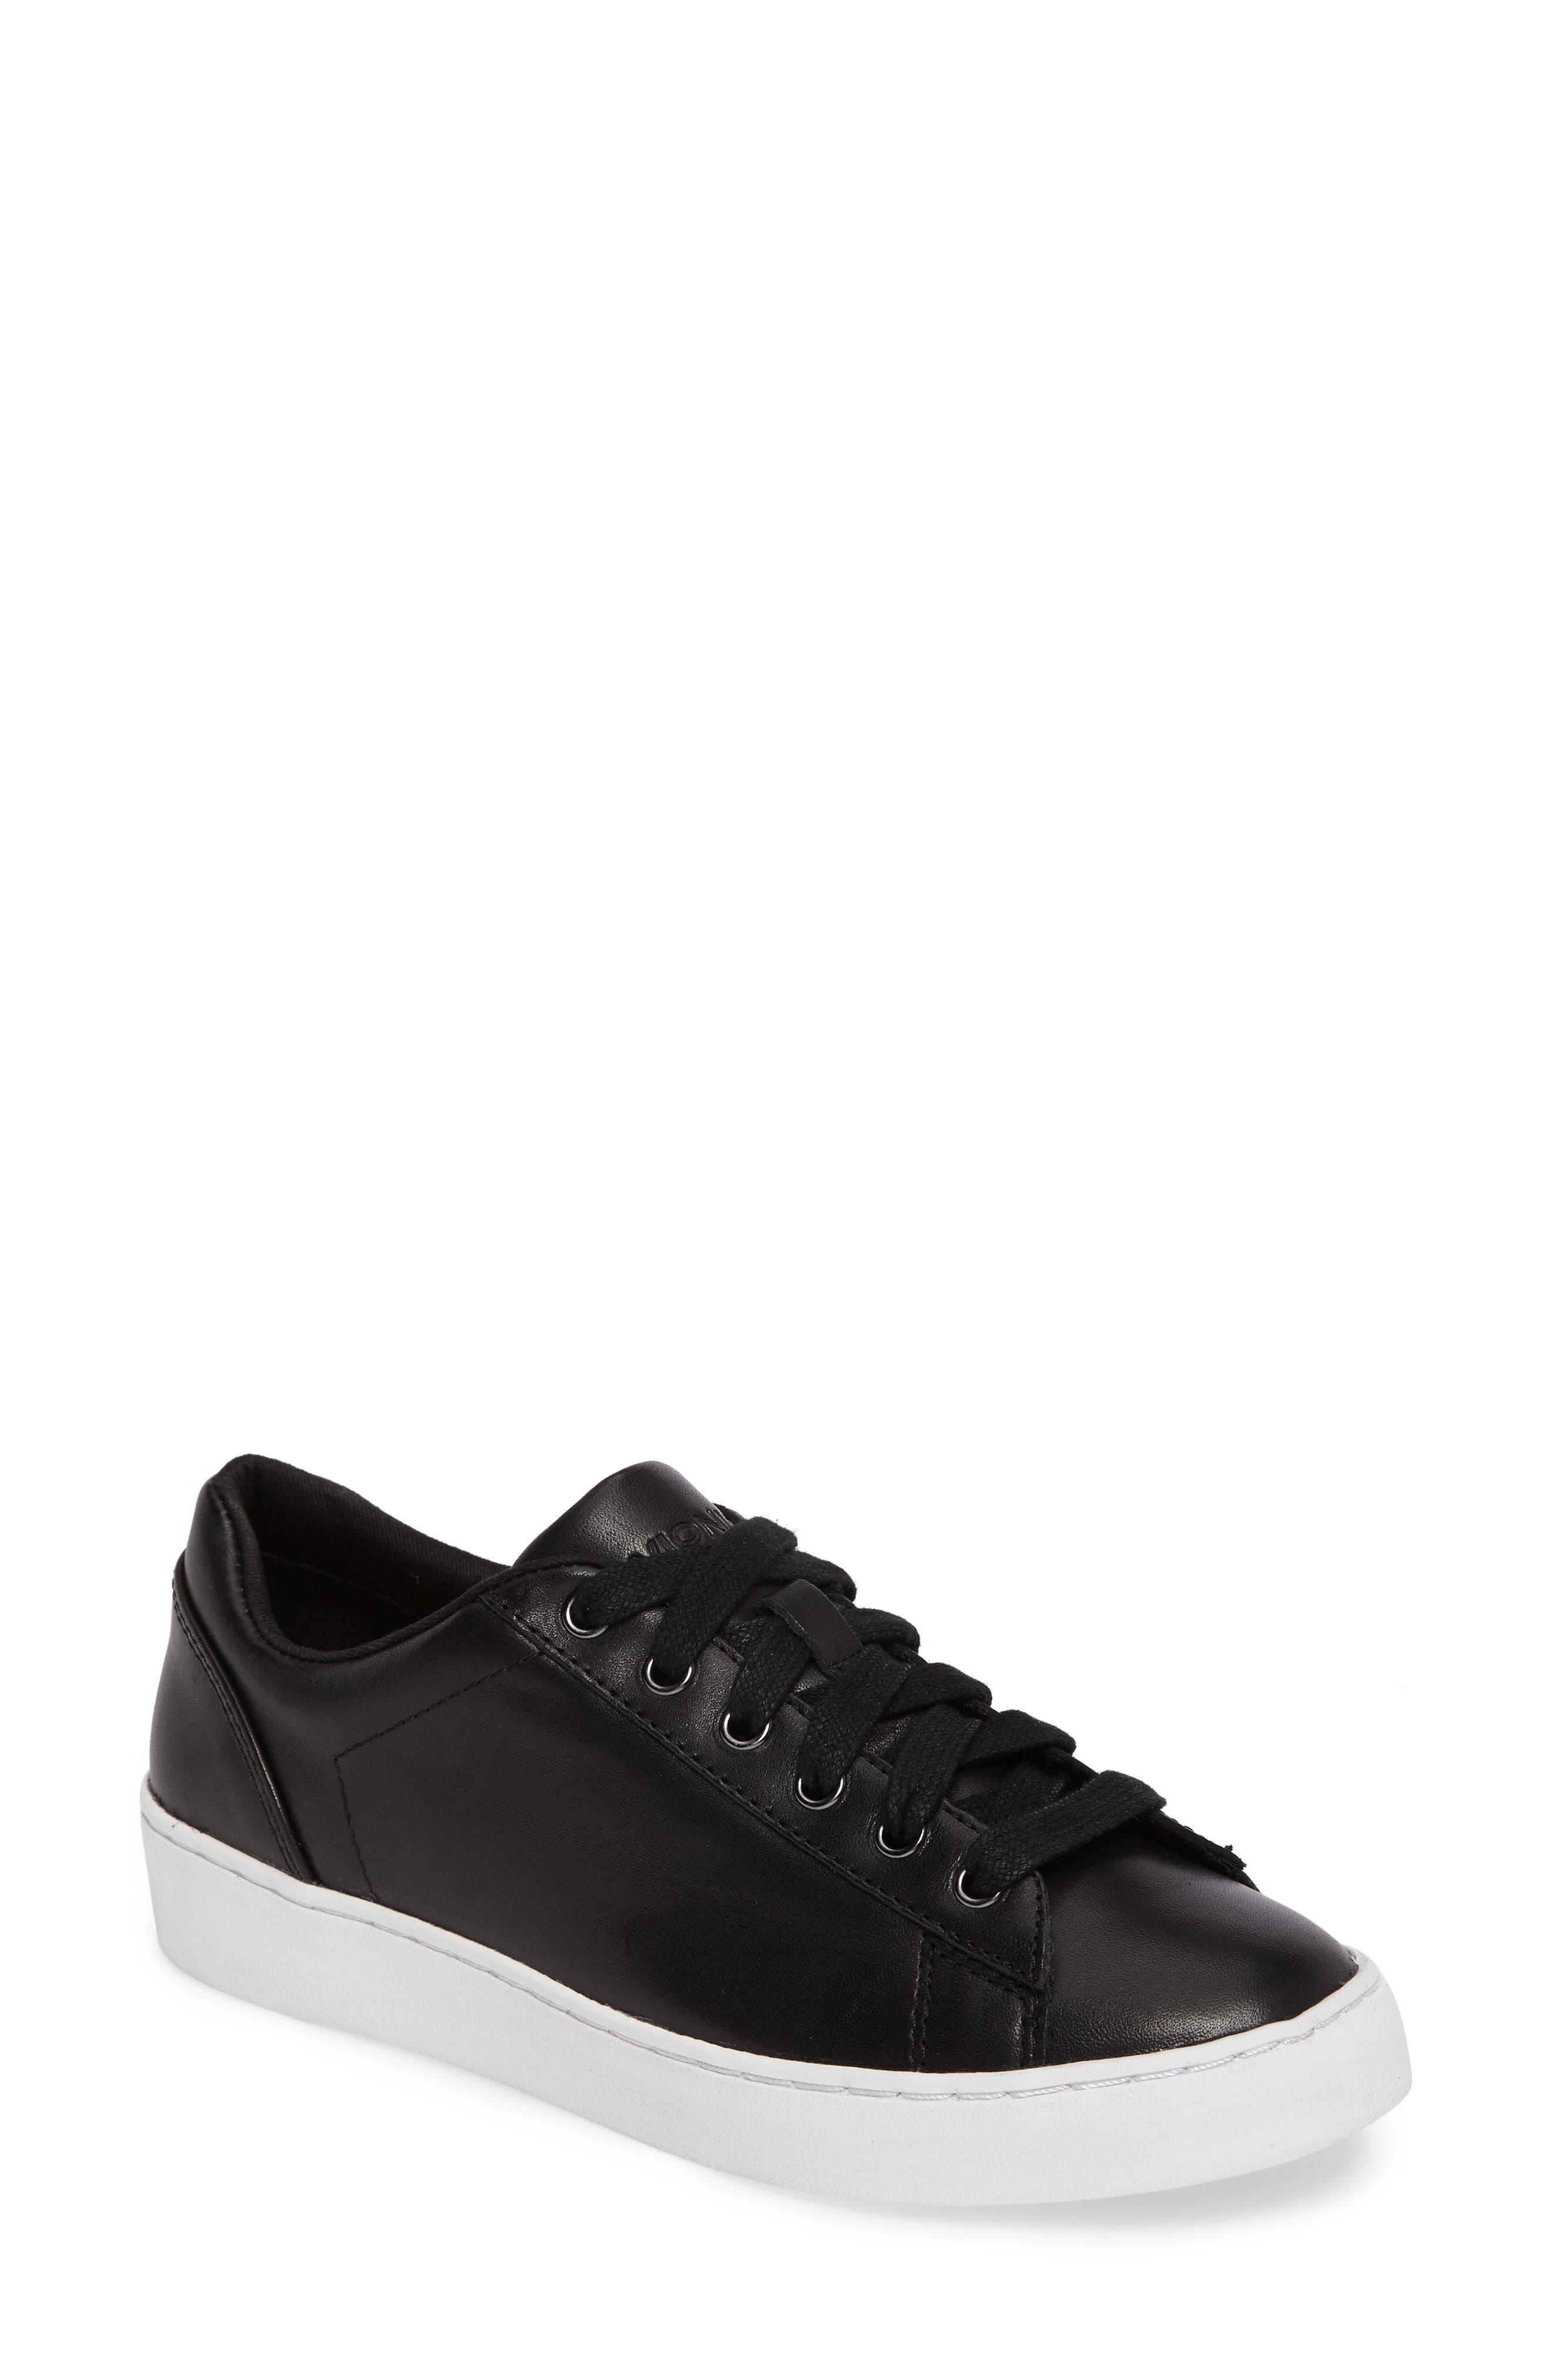 Splendid Syra Sneaker,                         Main,                         color, 001